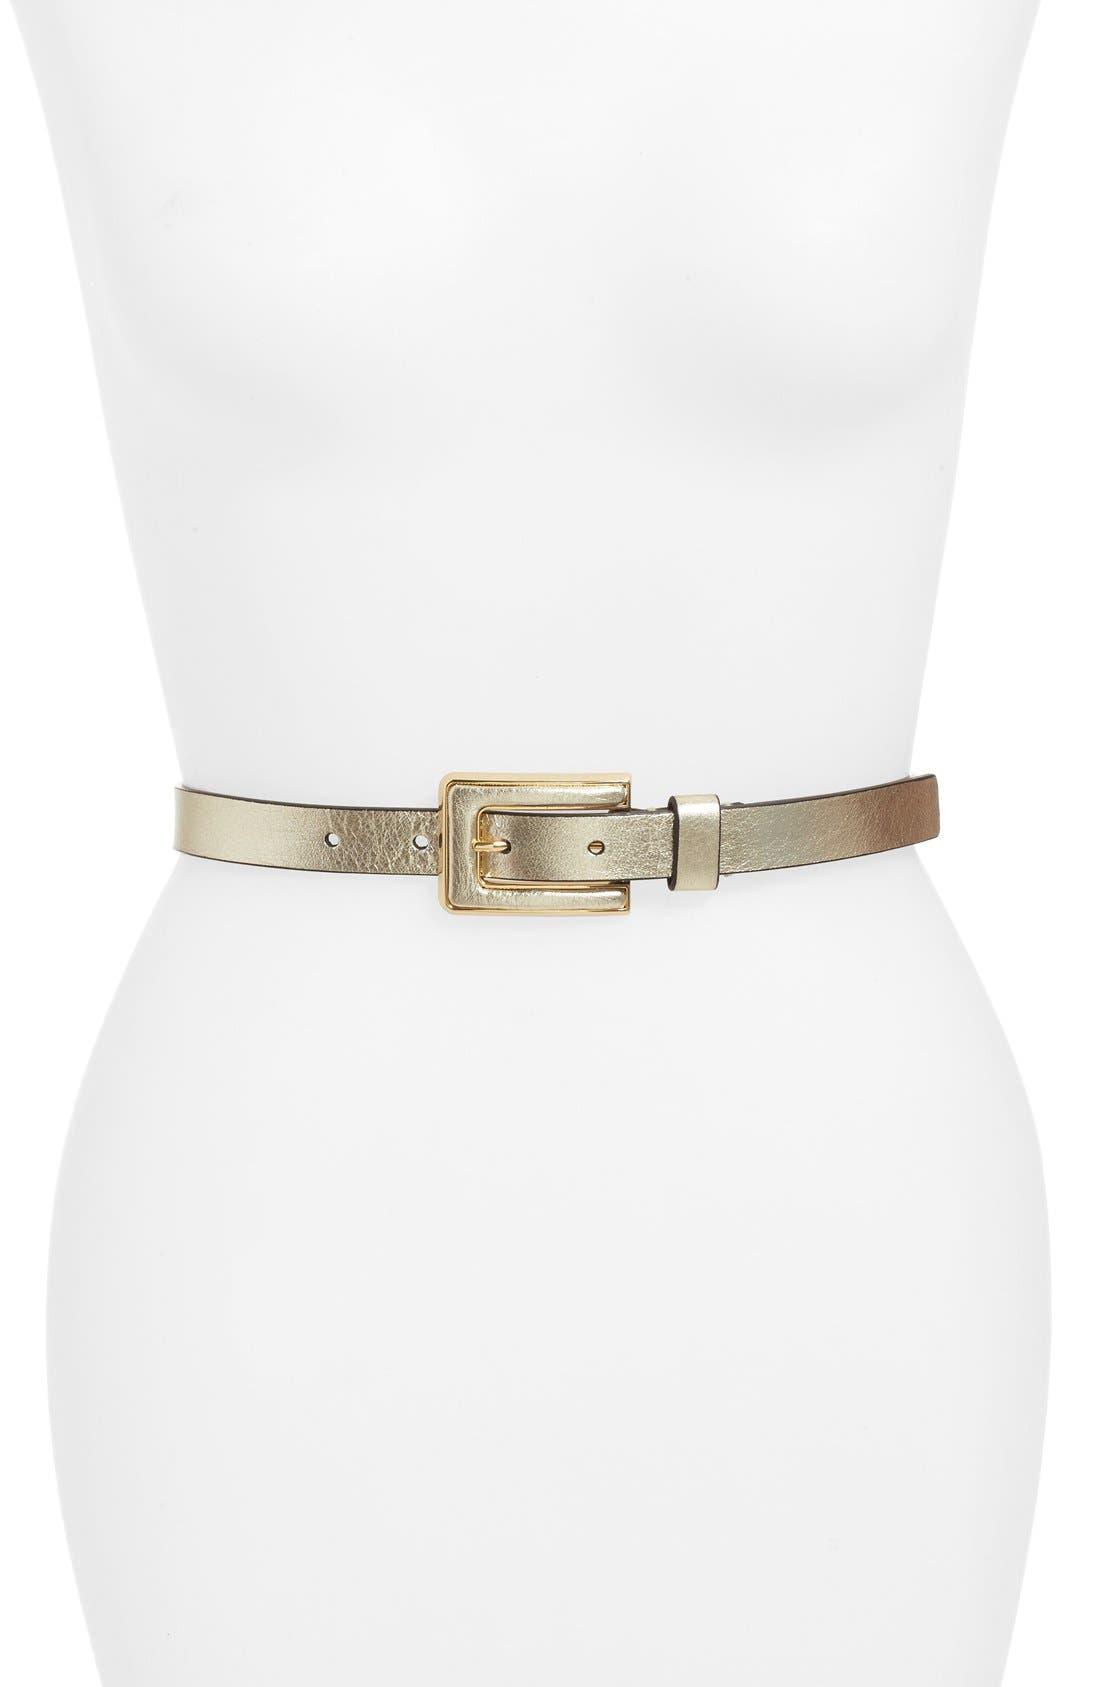 KATE SPADE NEW YORK metallic leather belt, Main, color, 710